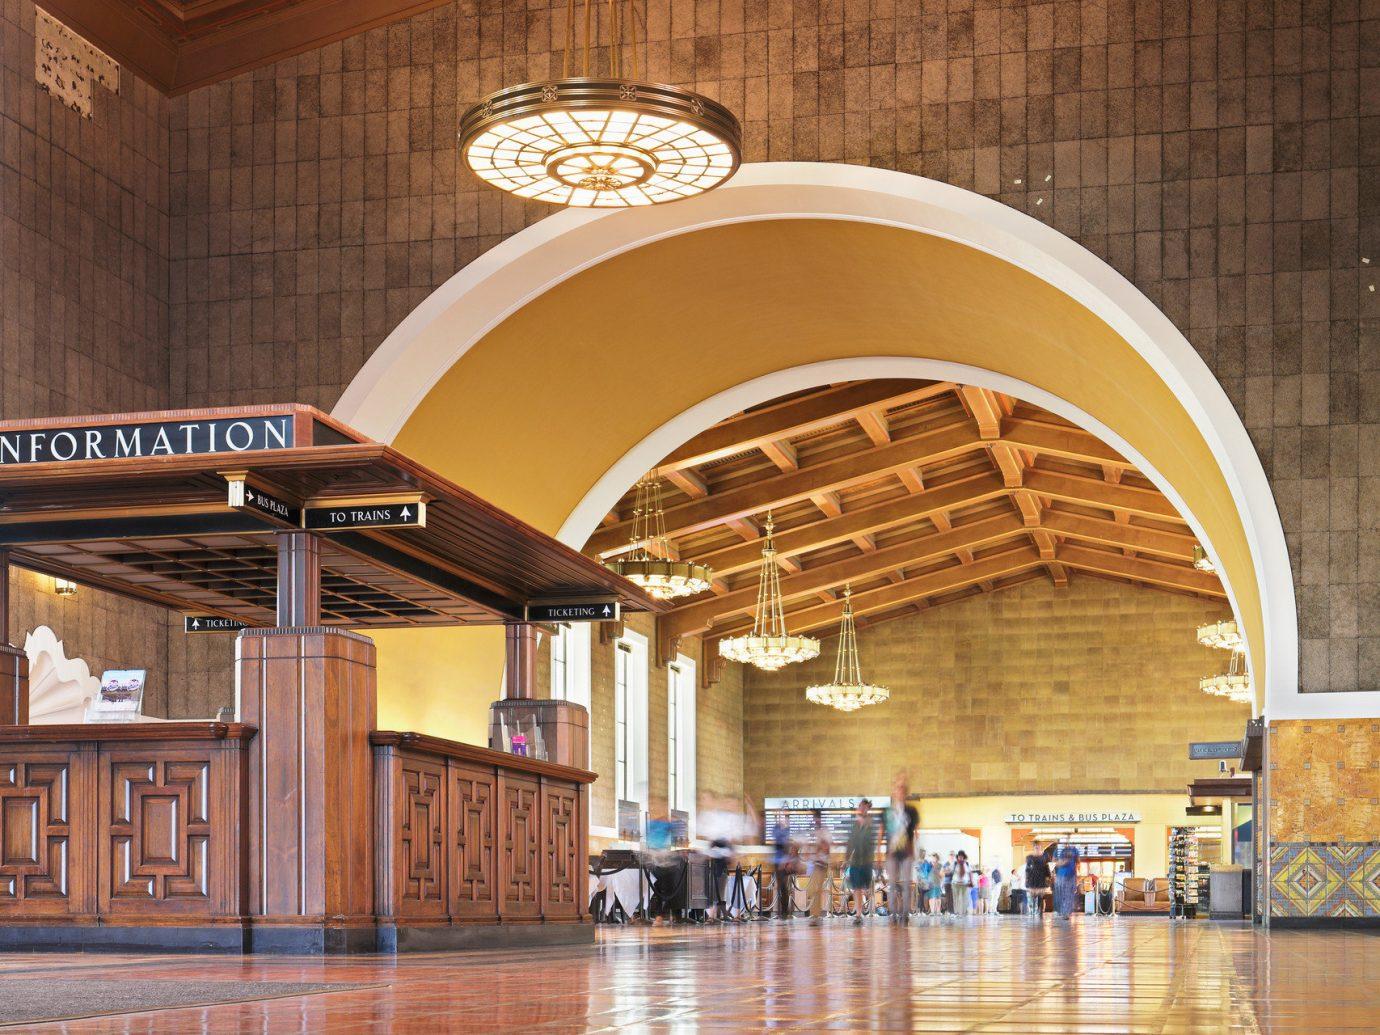 Trip Ideas building indoor floor Lobby Architecture library interior design arch shopping mall plaza hall tourist attraction arcade auditorium